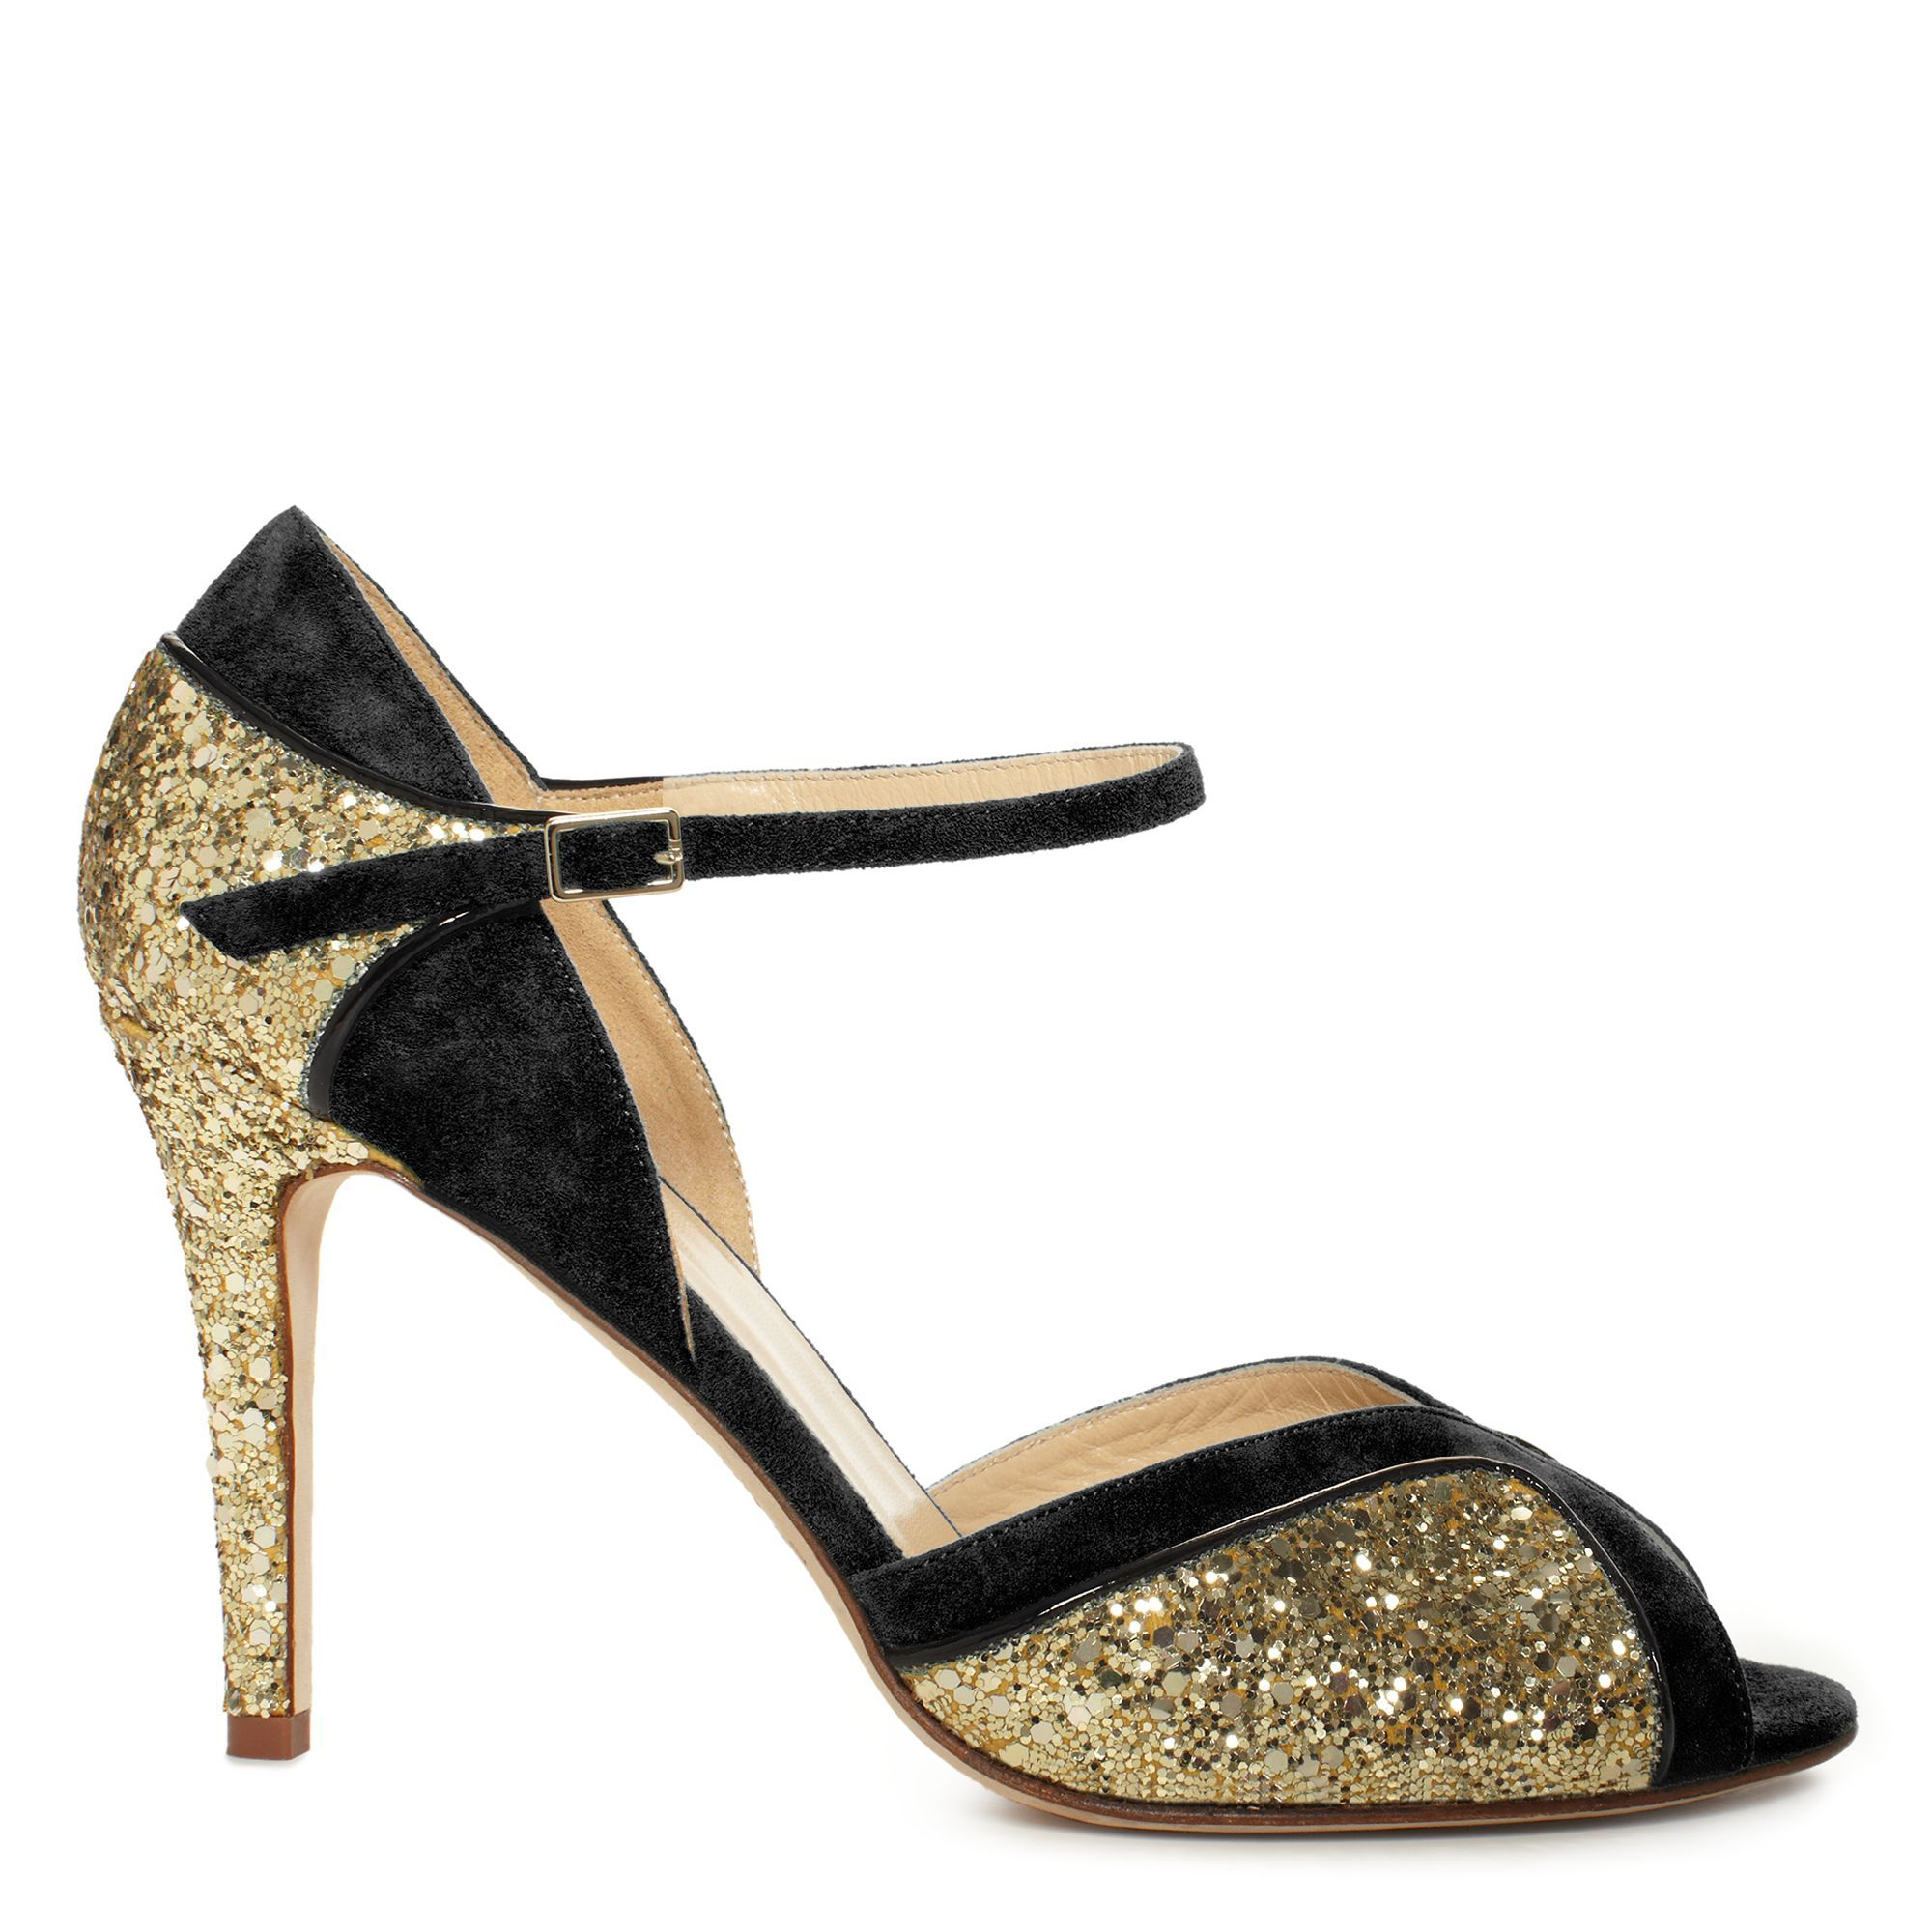 black and gold glitter heels #KateSpade